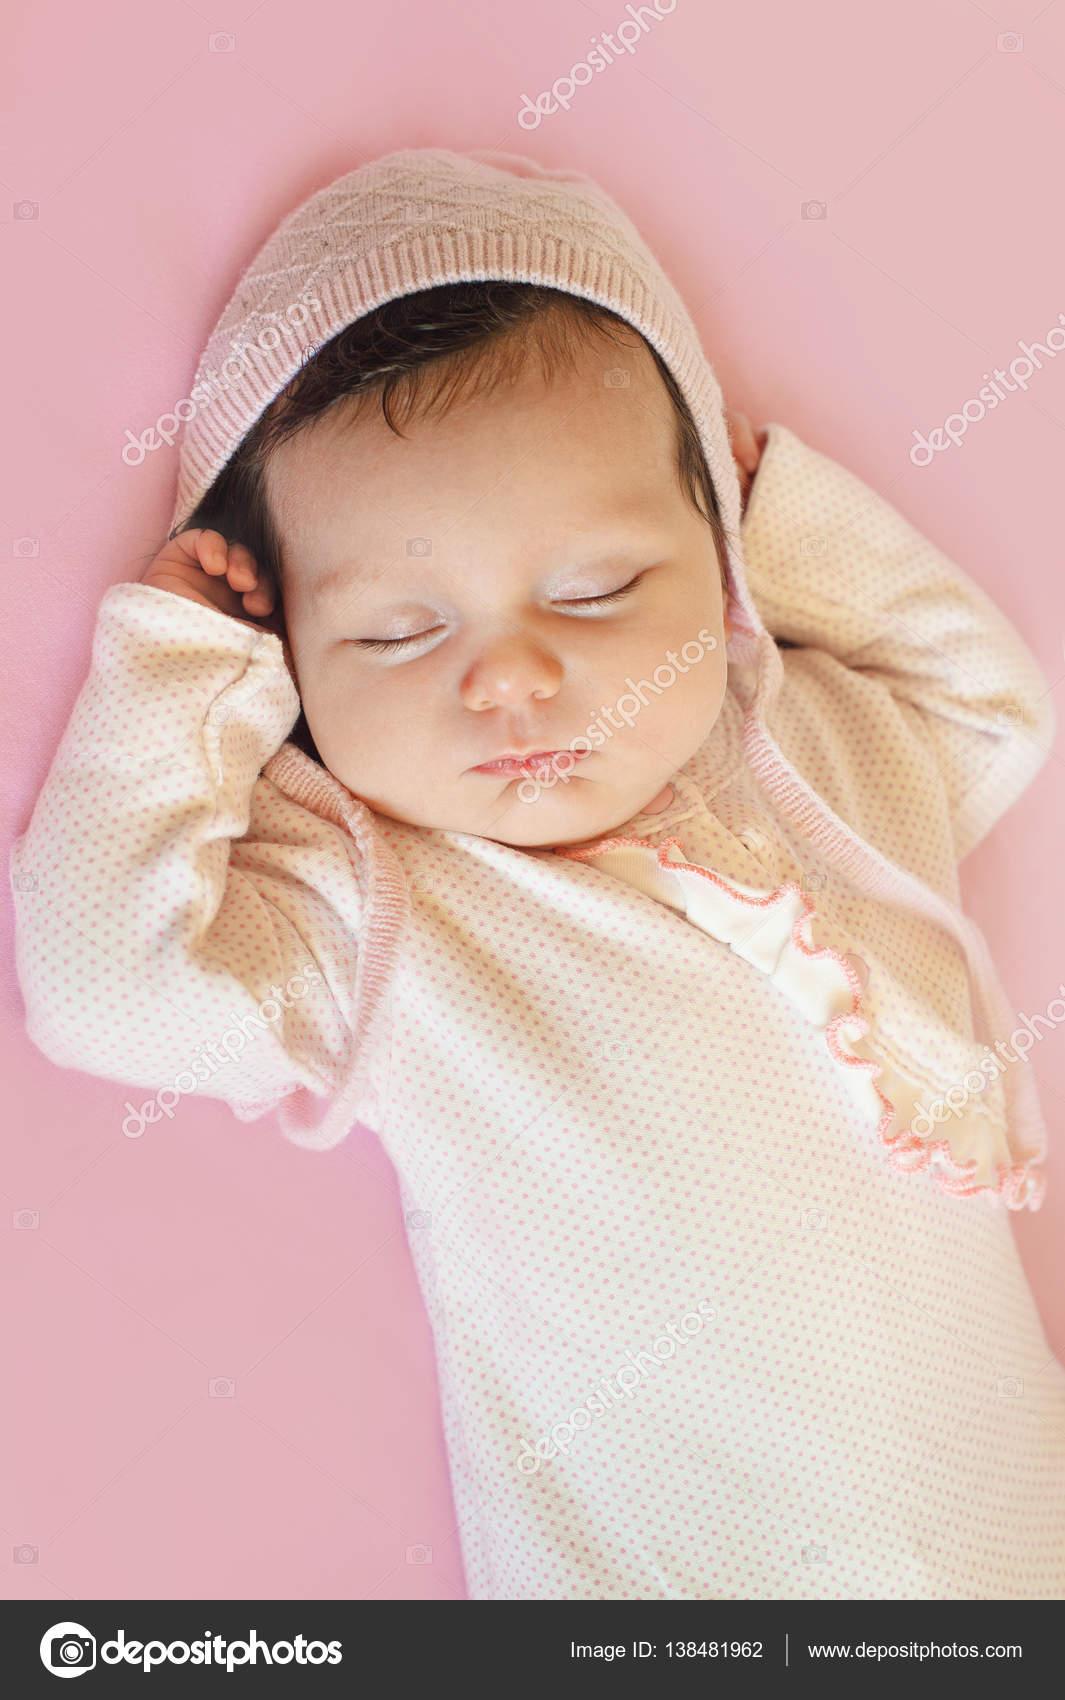 newborn sweet cute baby girl face sleep — stock photo © nfbiruza